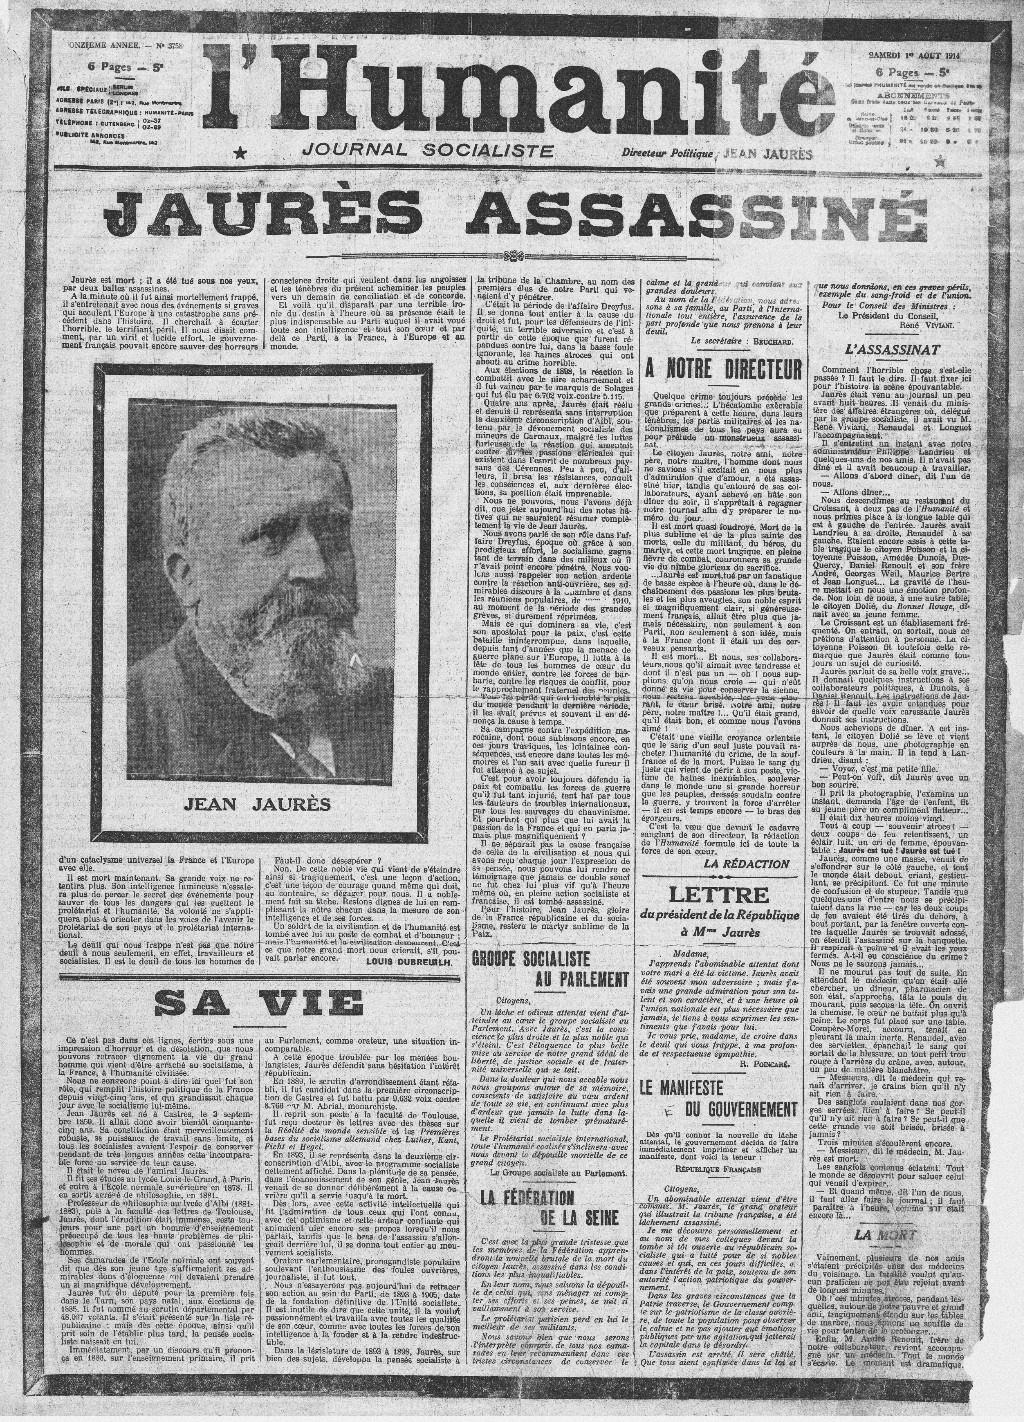 Jean Jaures: brief biography 58